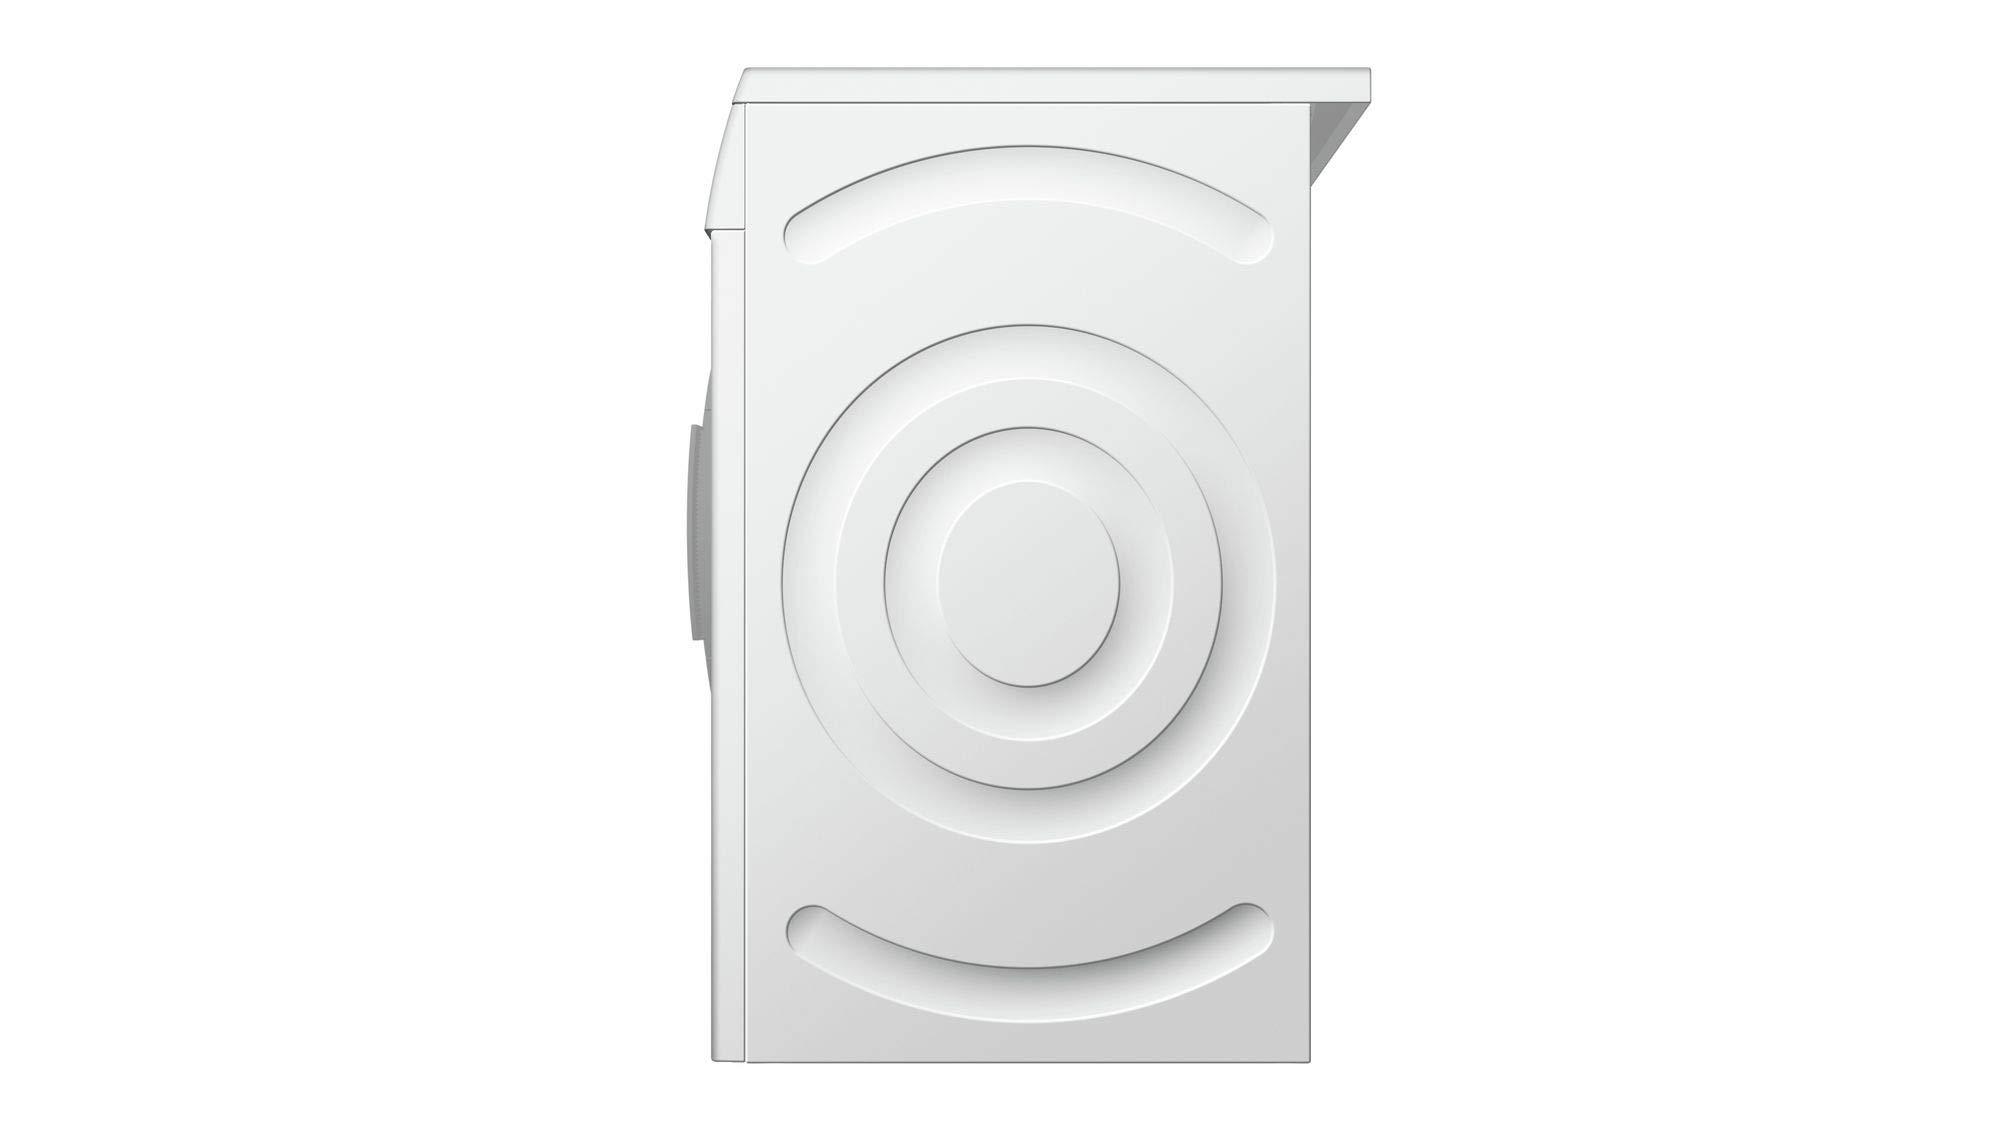 Bosch-WAE282E0-Waschmaschine-Frontlader-1400-rpm-7-kilograms